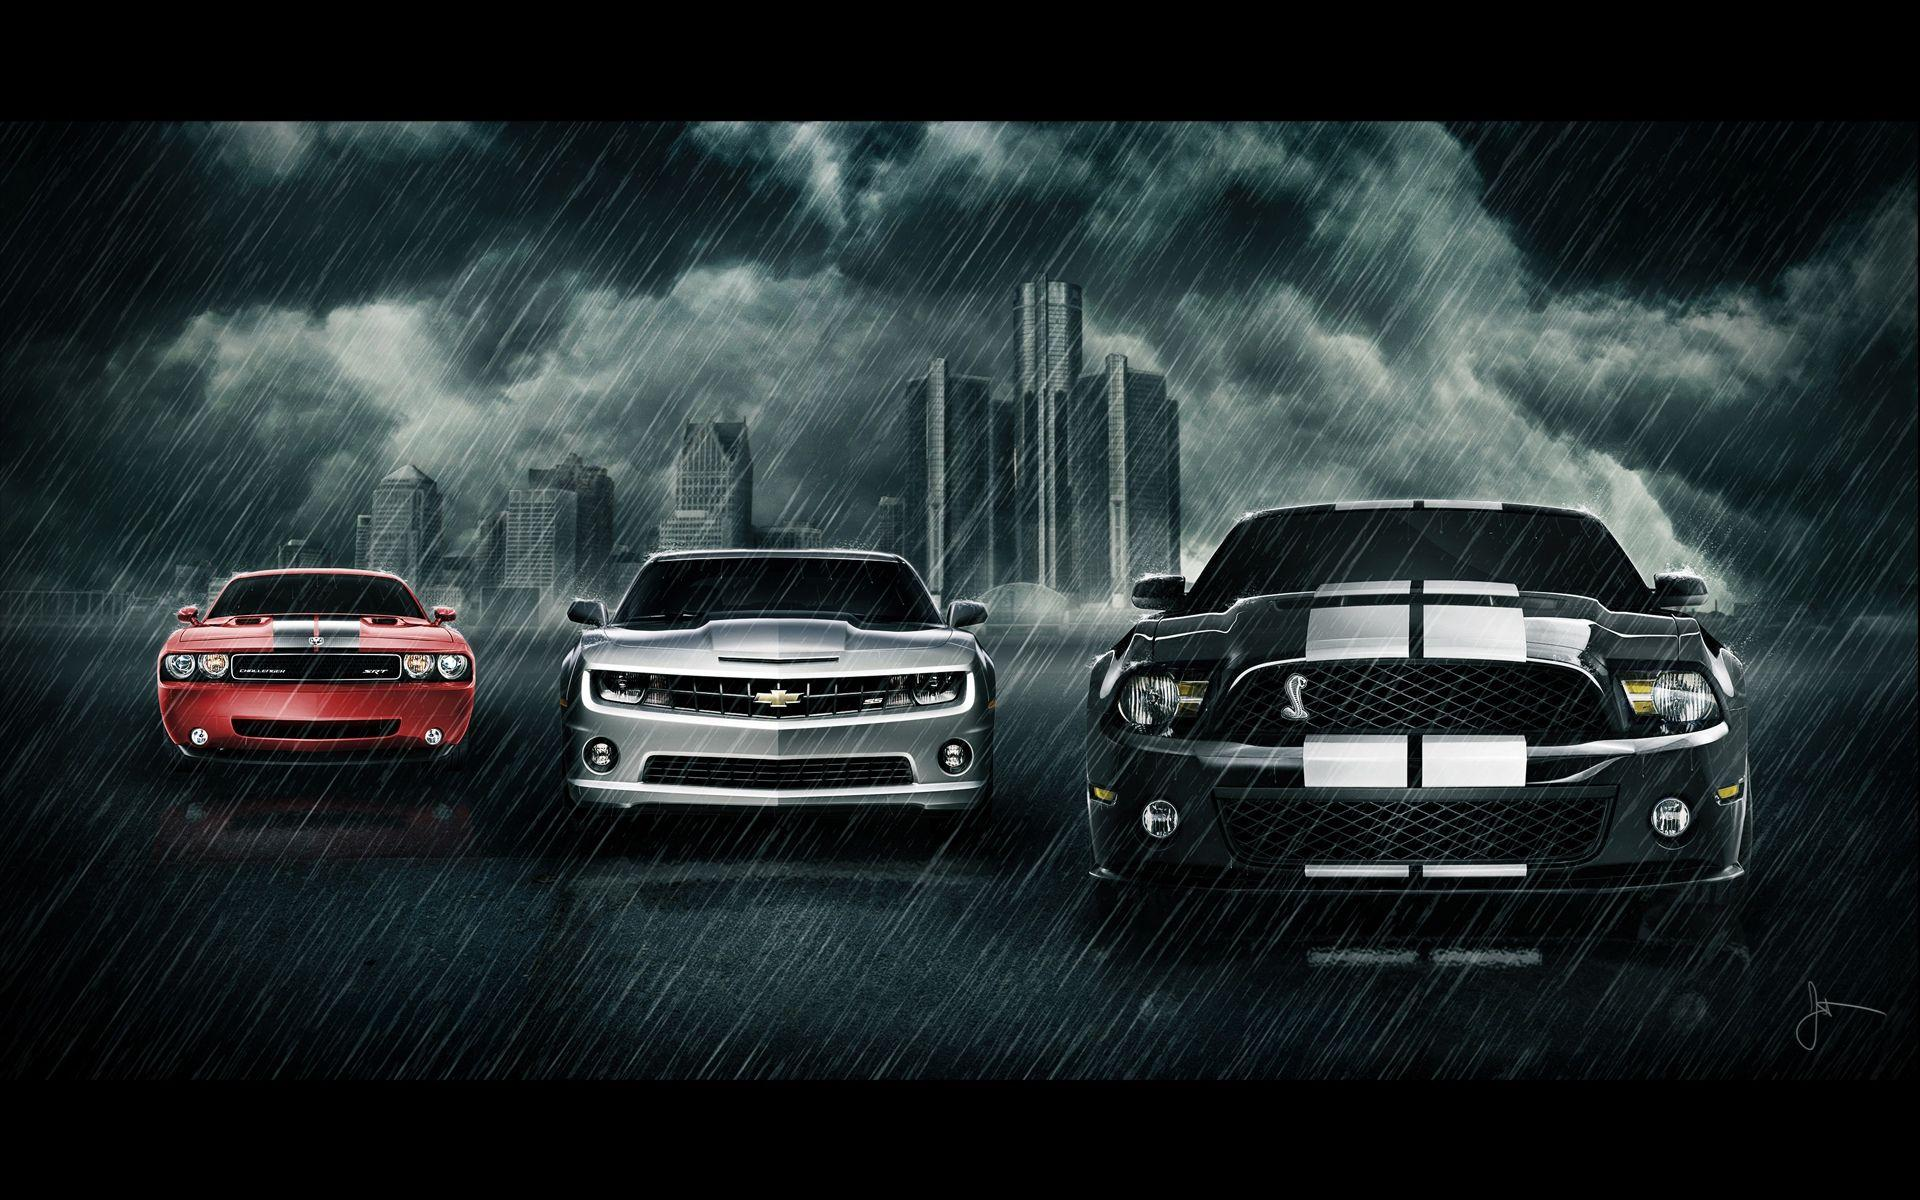 Mustang Cars Wallpapers Wallpaper Cave